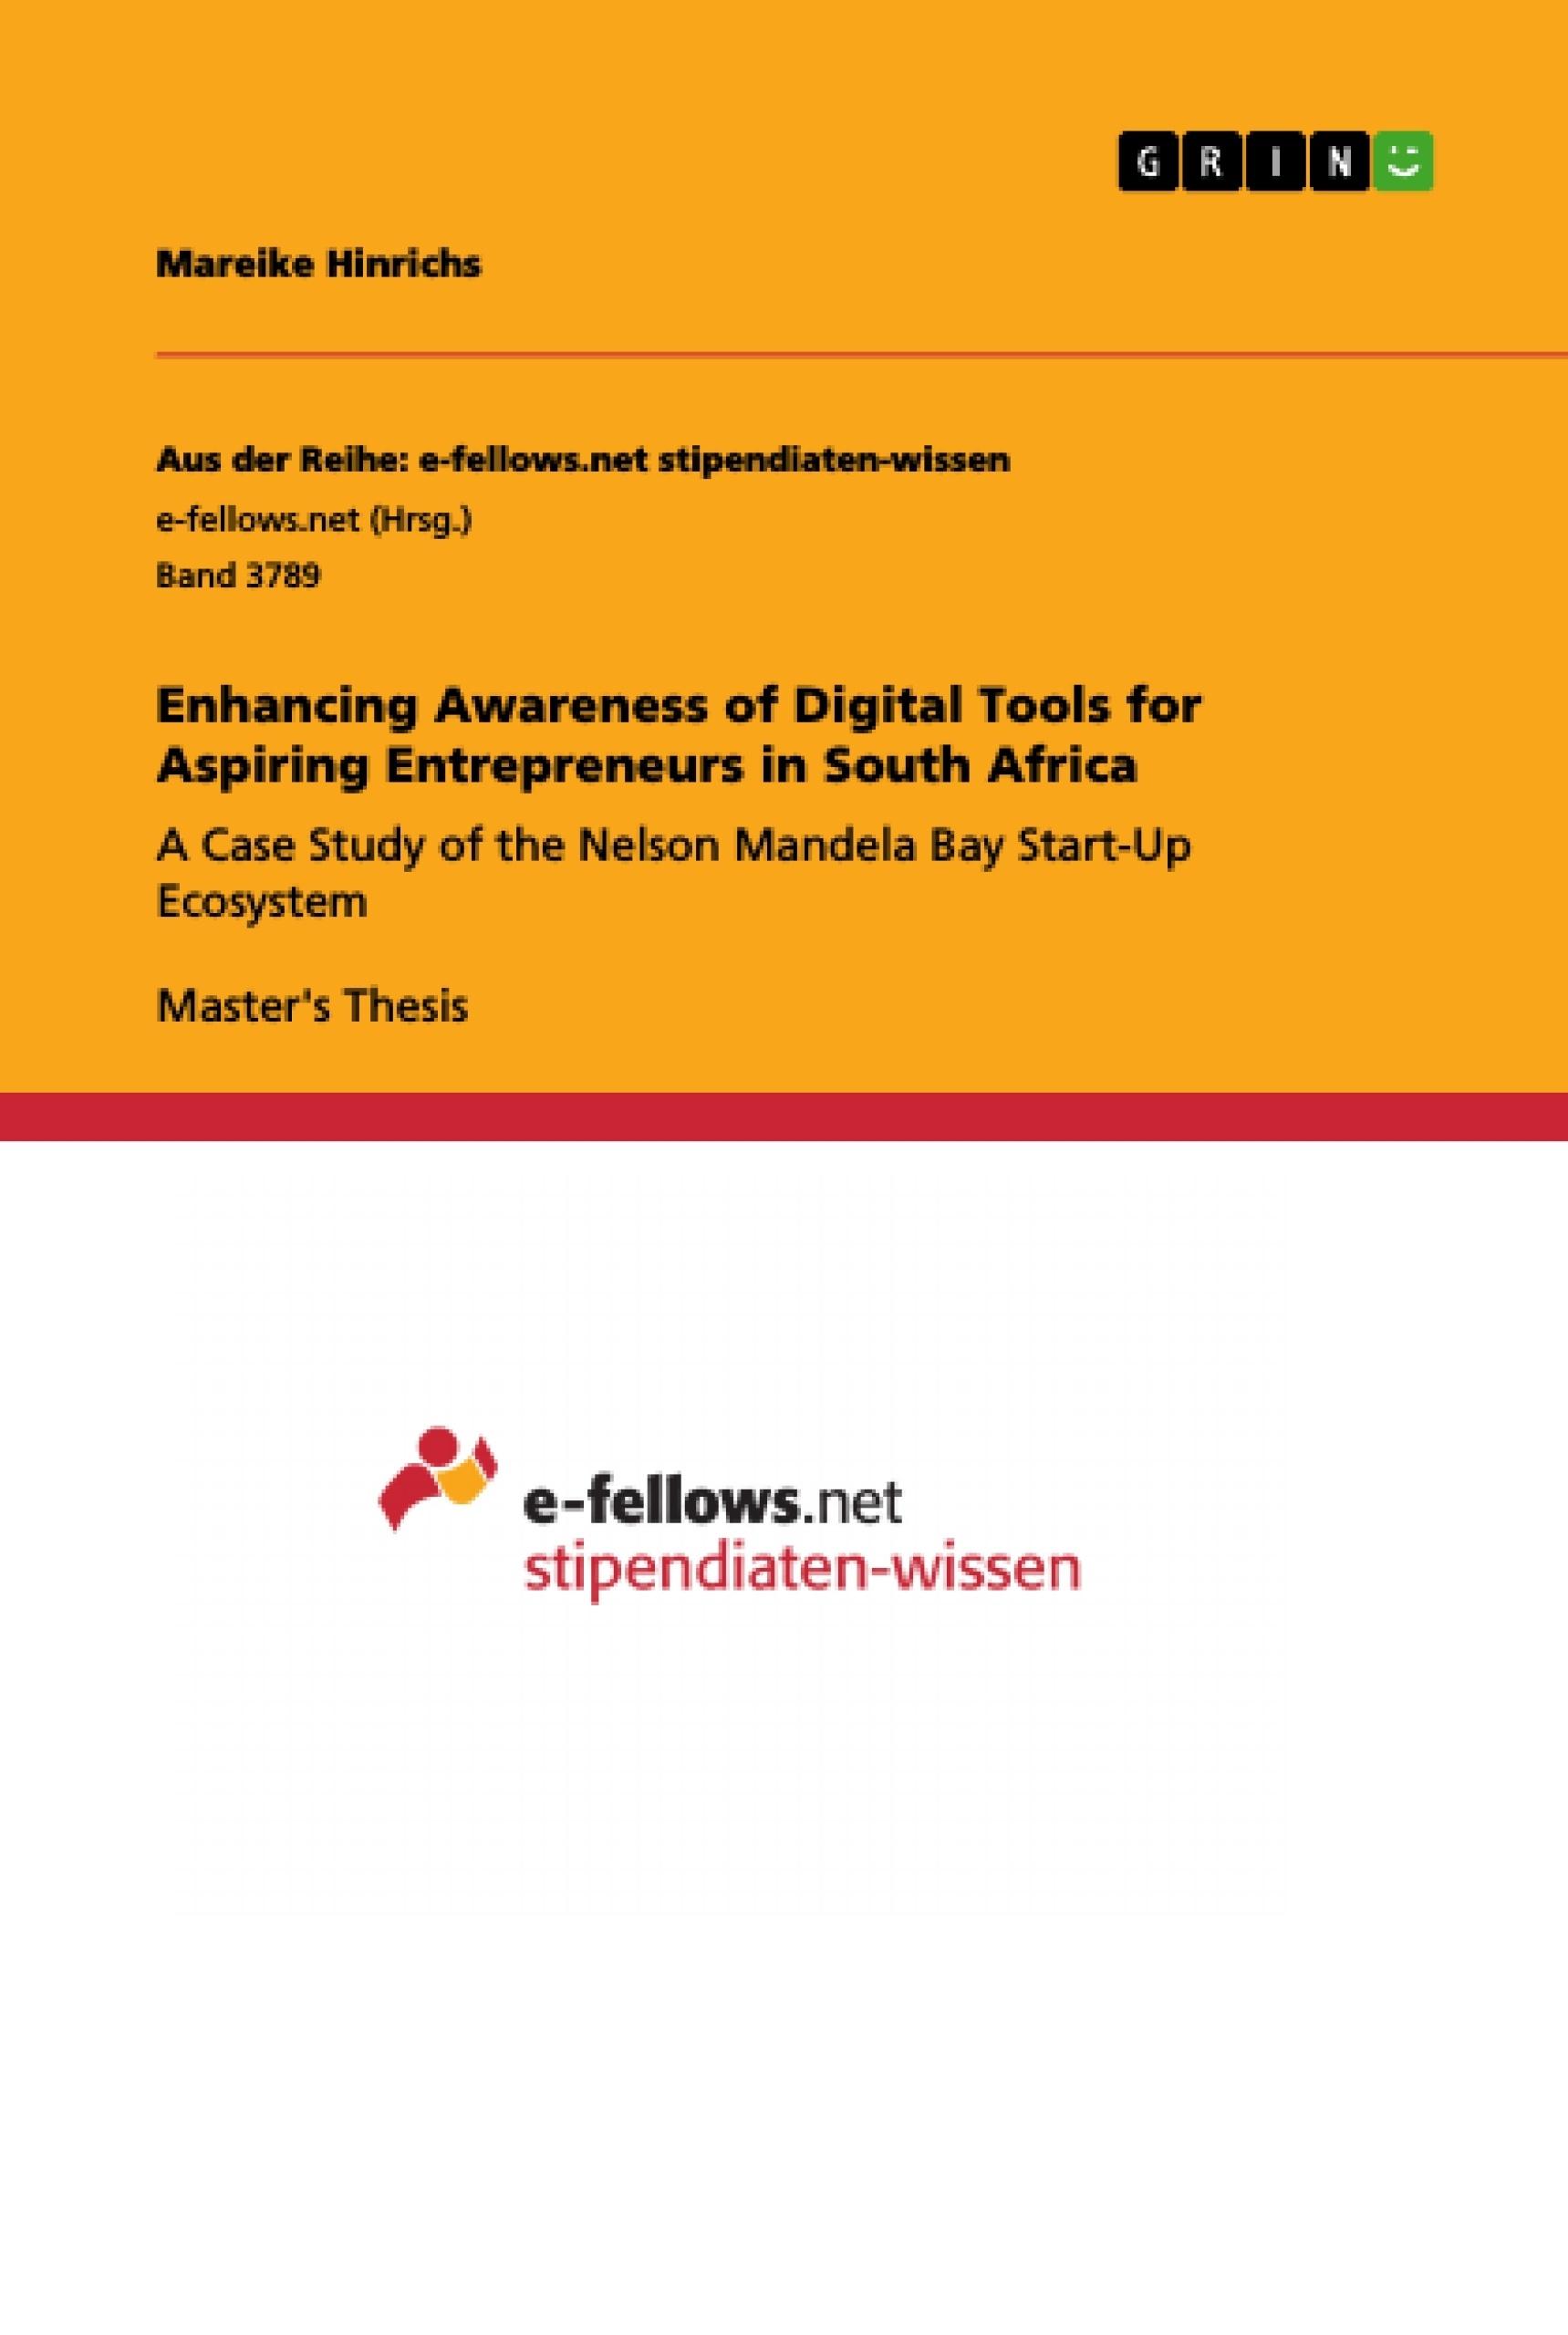 Title: Enhancing Awareness of Digital Tools for Aspiring Entrepreneurs in South Africa